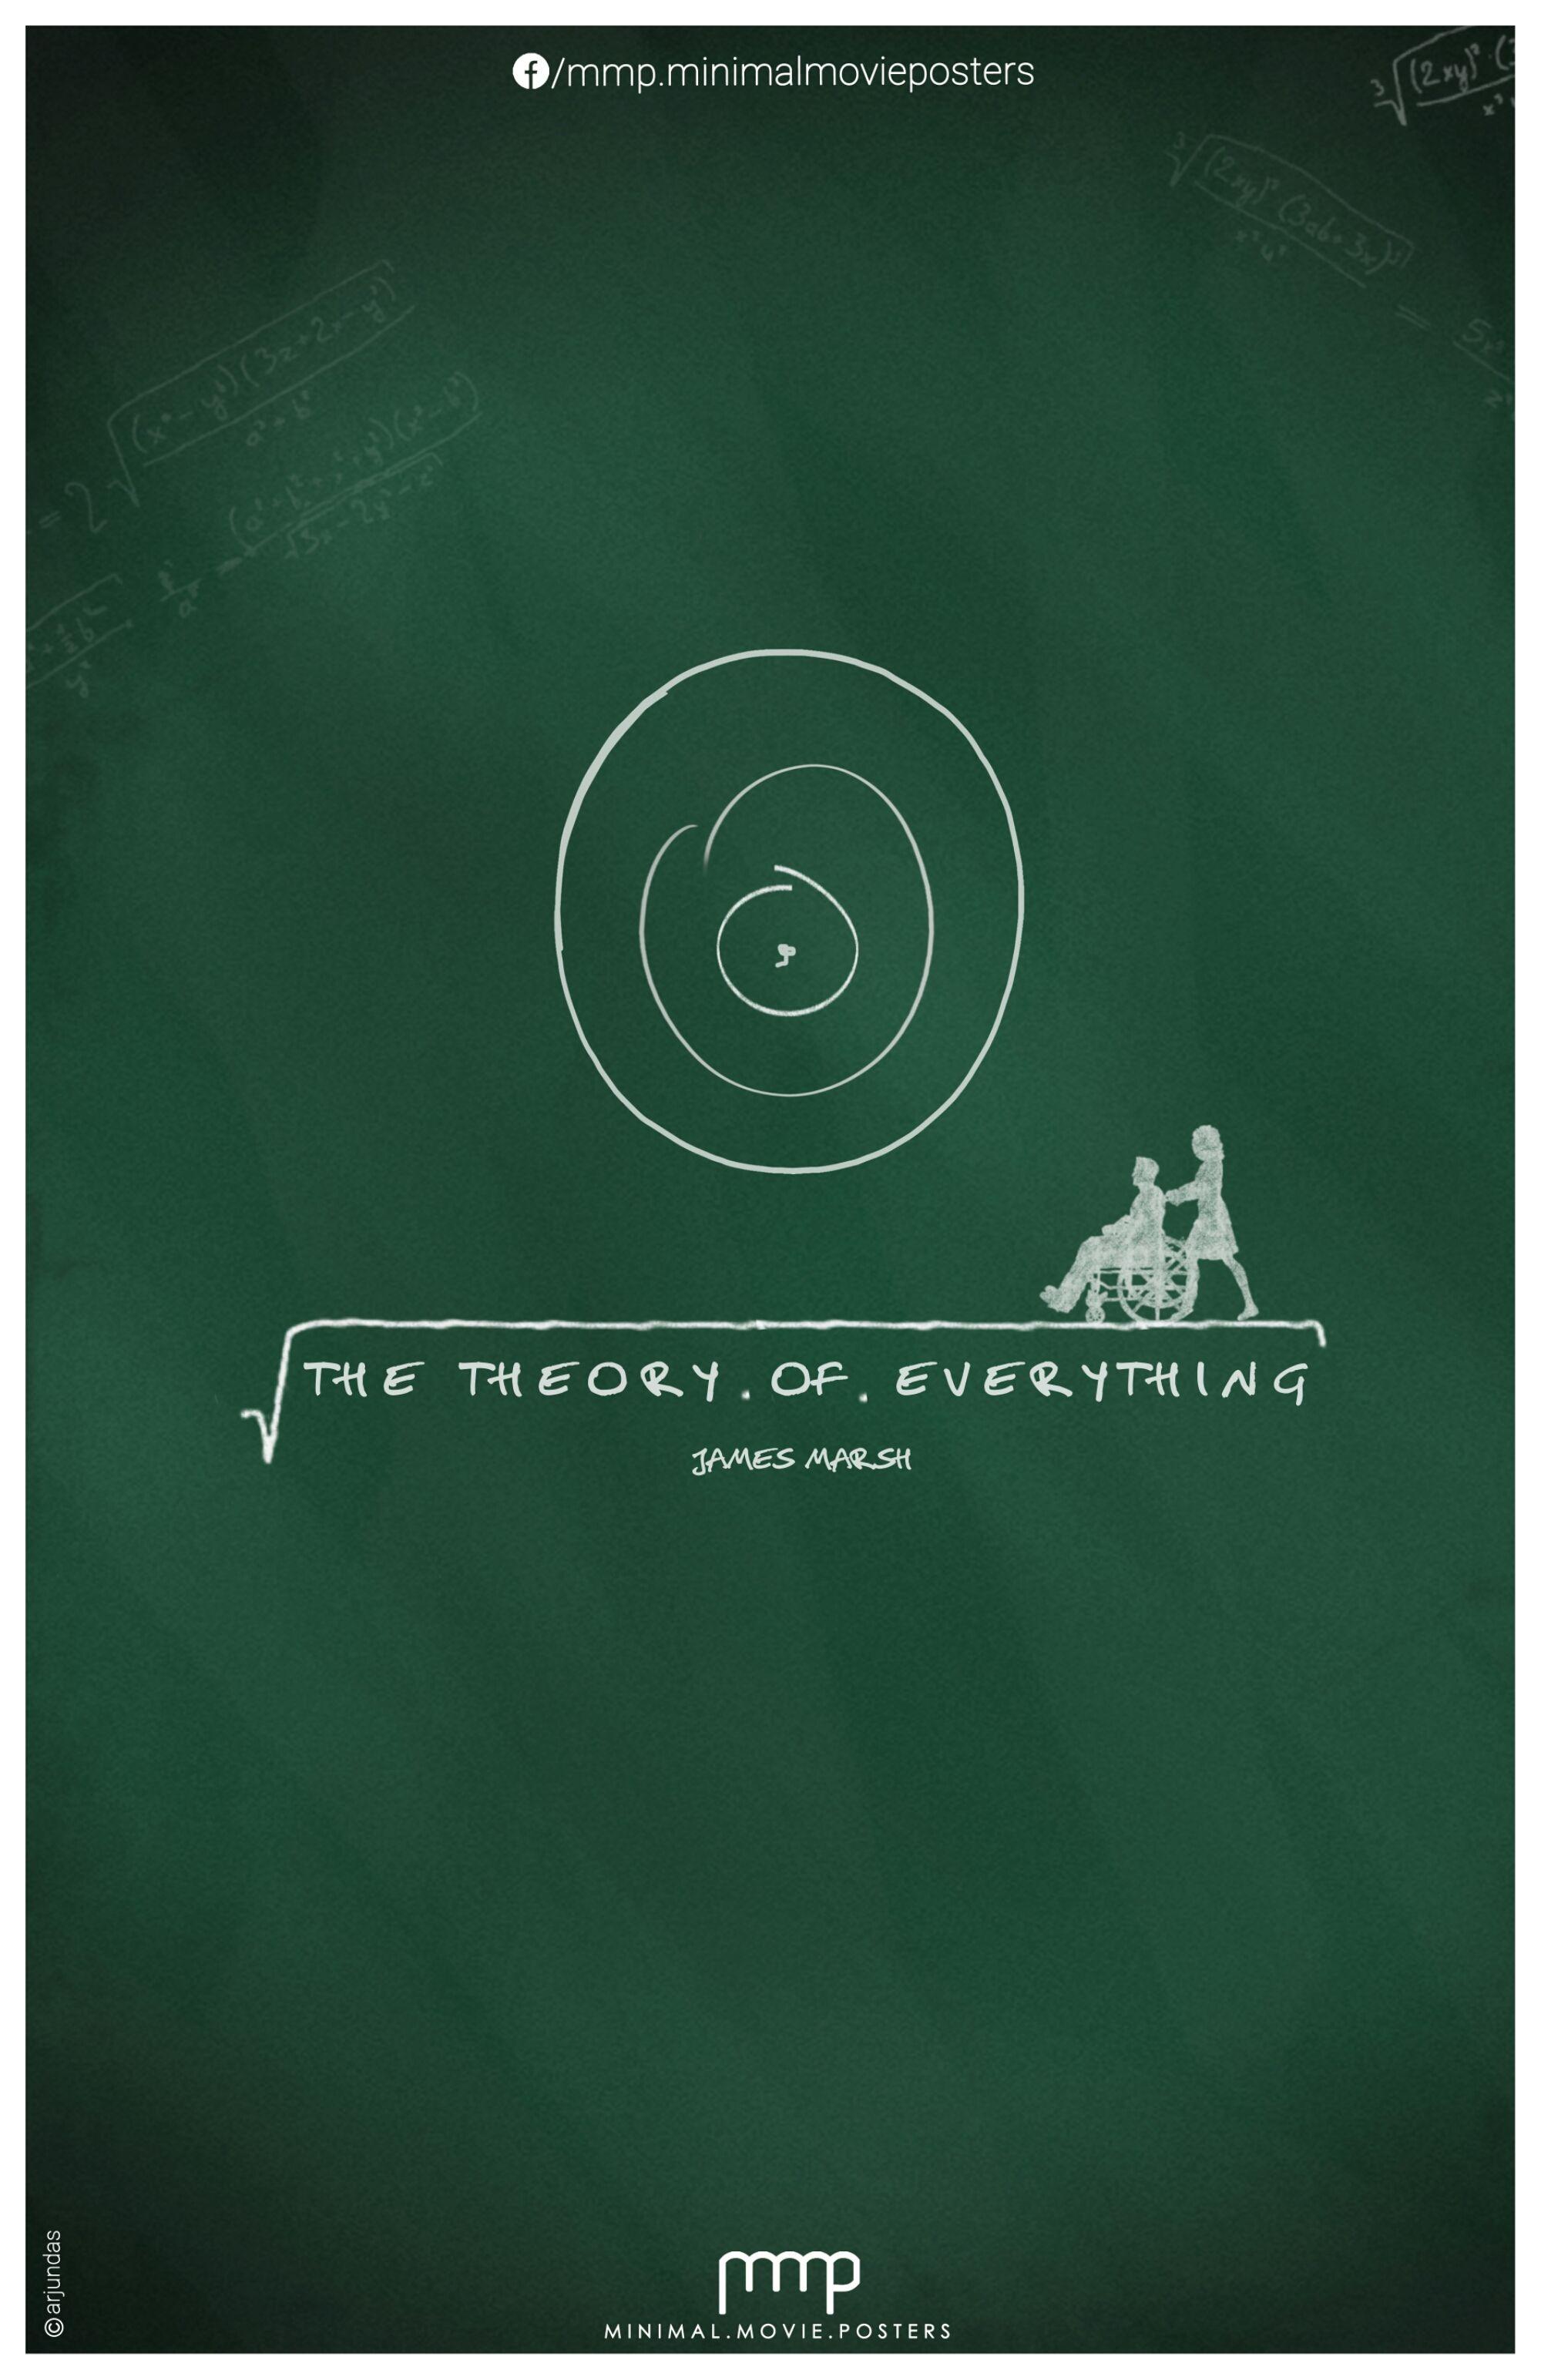 The Theory Of Everything Minimalist Movie Poster Movie Posters Minimalist Movie Posters Minimalist Movie Poster